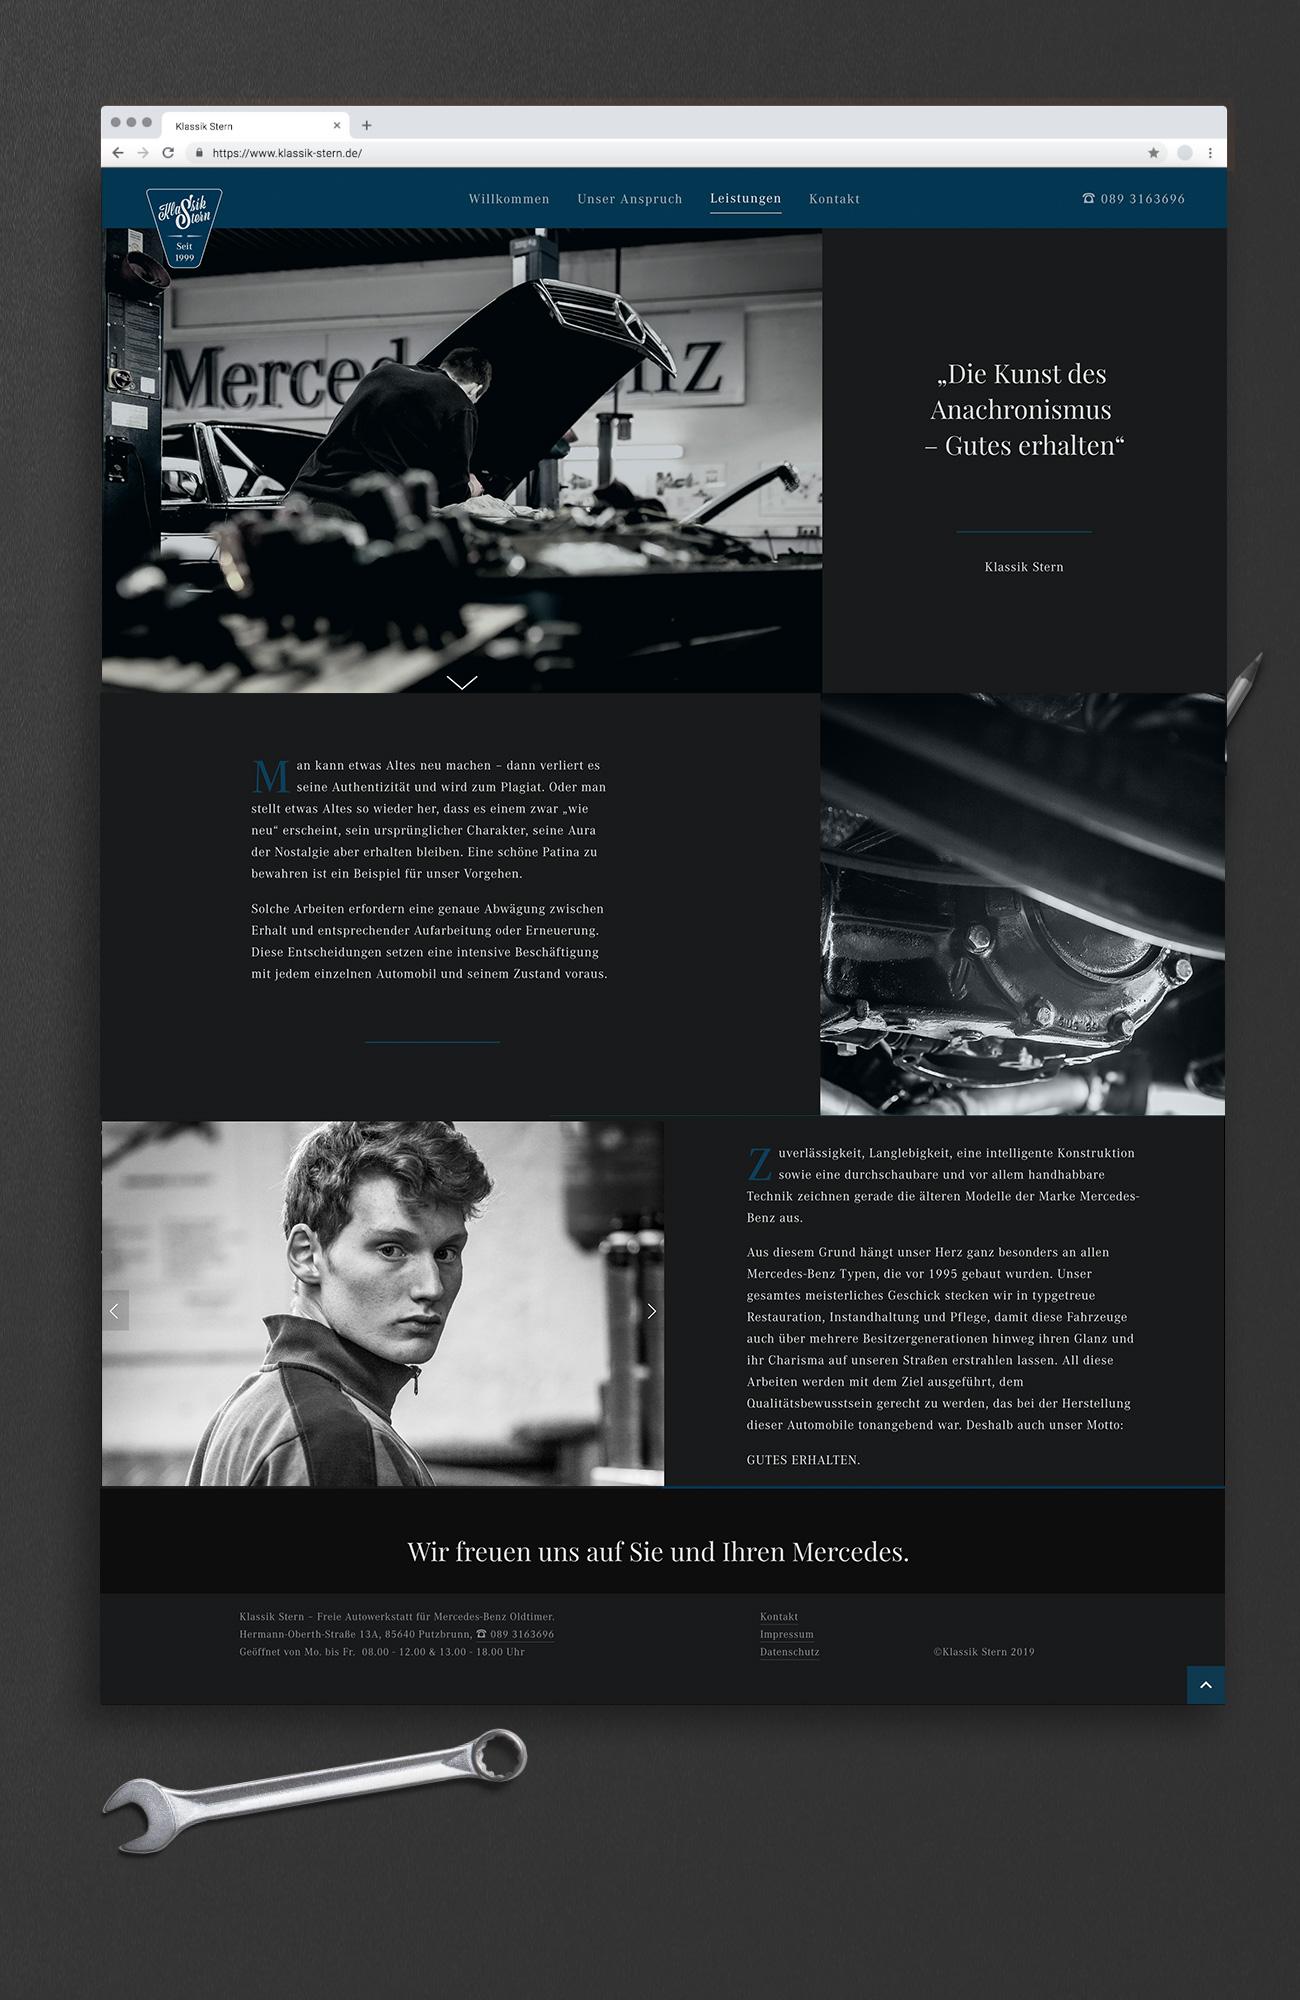 Studio-michael-seidl-klassikstern_mercedes-webdesign.jpg